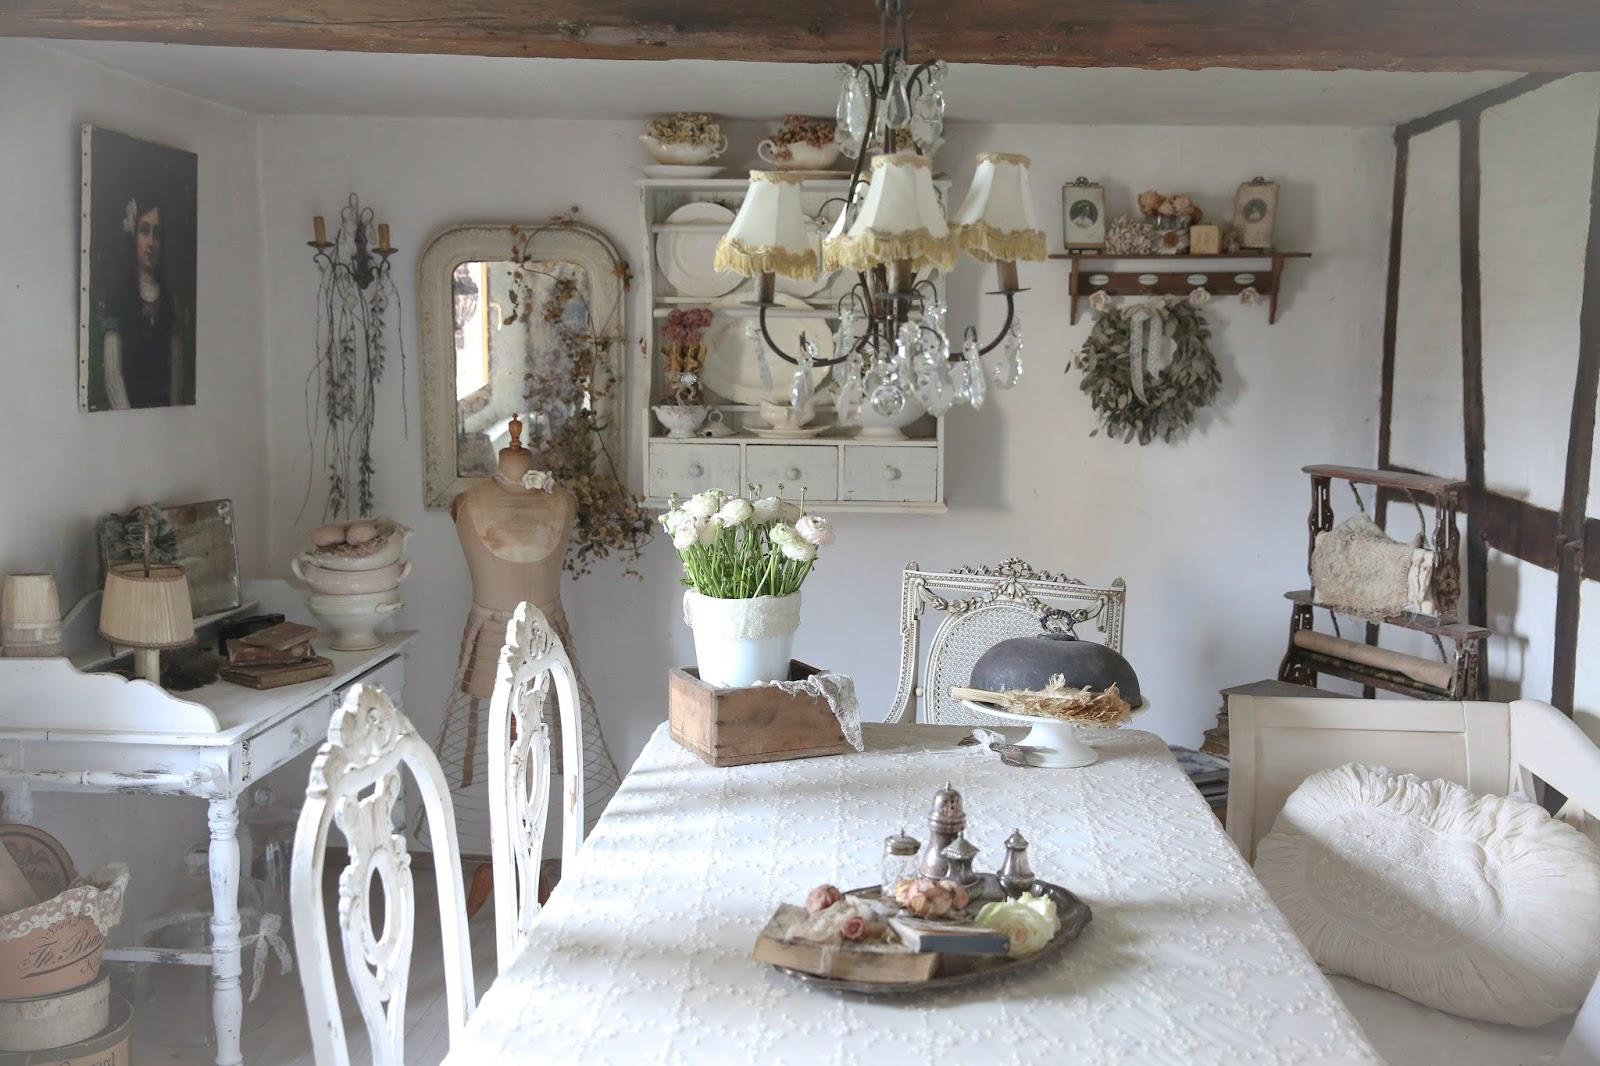 vintage moments urlaubstage planung der neuen k che. Black Bedroom Furniture Sets. Home Design Ideas